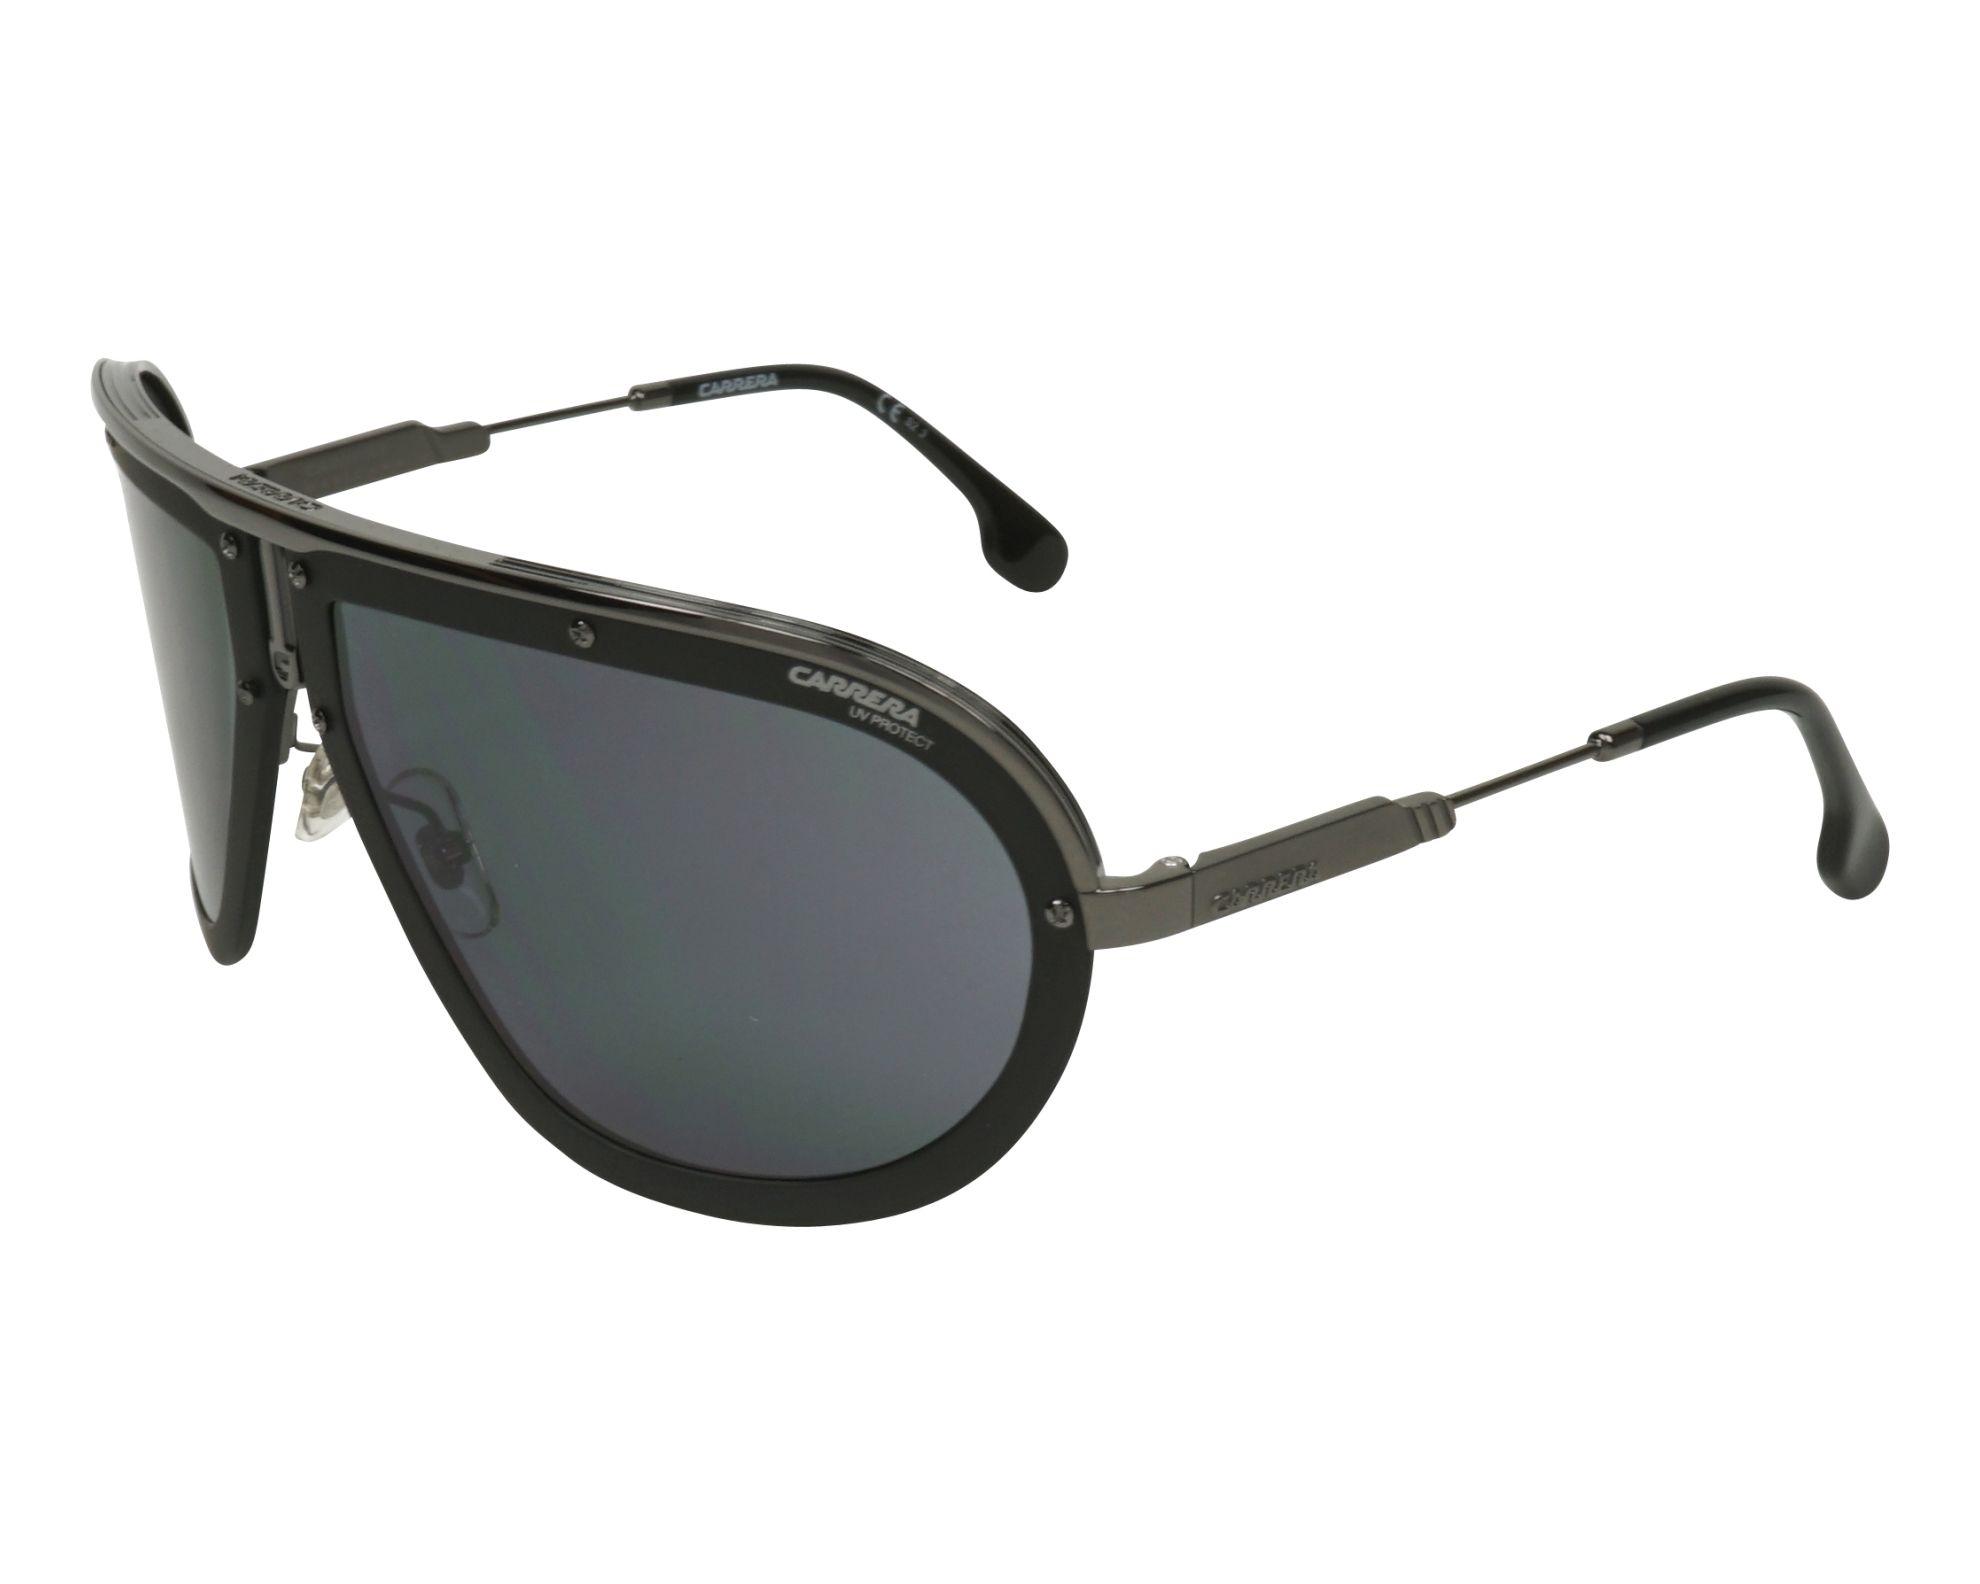 8831aefc31 Sunglasses Carrera AMERICANA KJ1 2K 66-17 Black Gun profile view